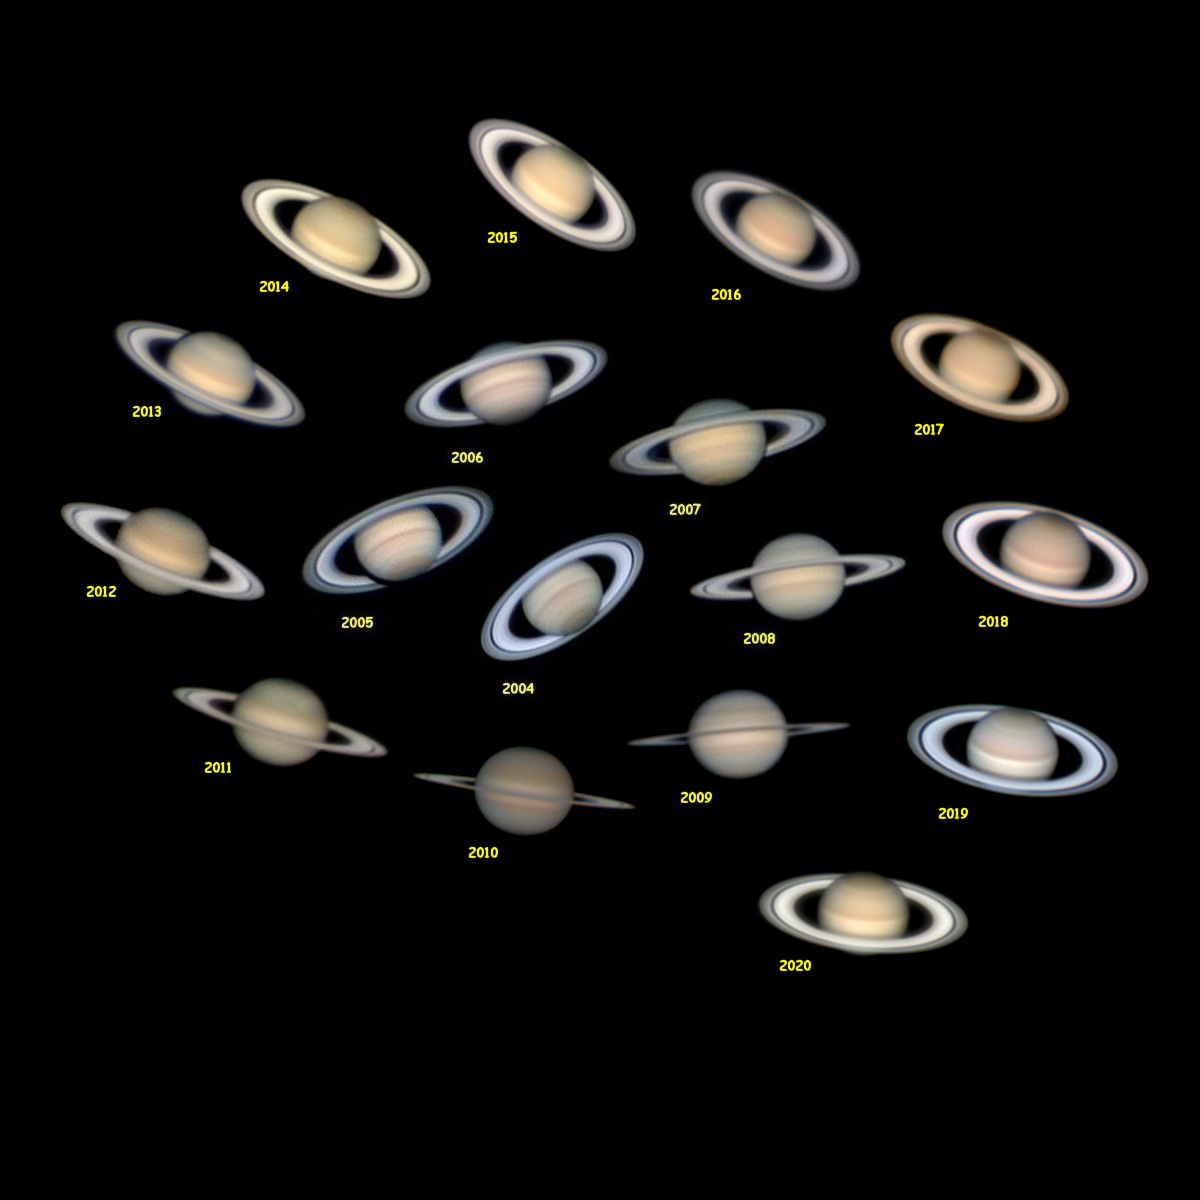 Saturne2004-2020-3.png.276aae198ef280b0a16b4c6795922d5b.png